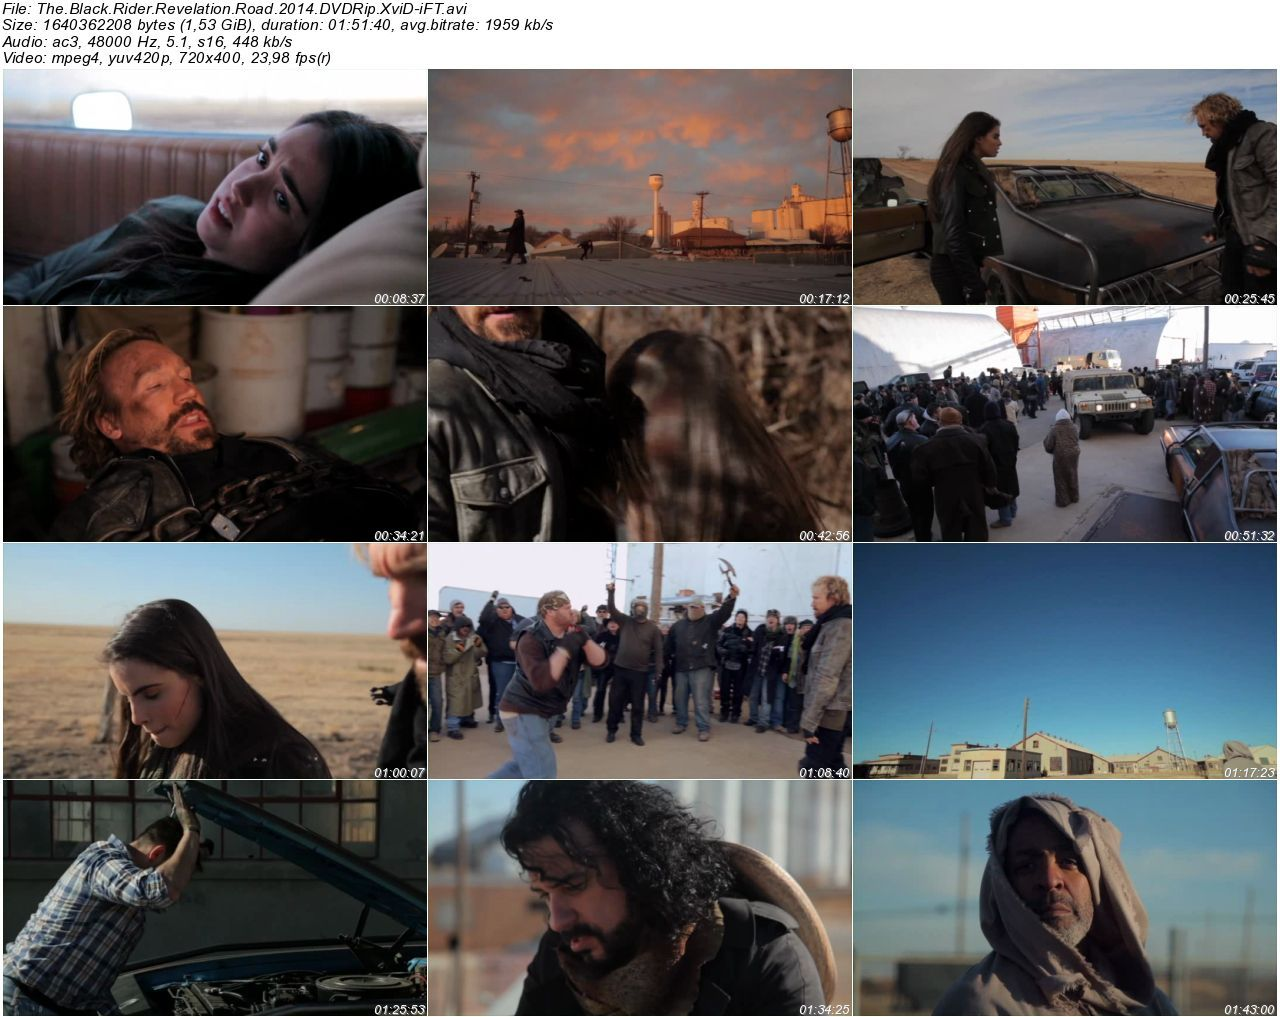 The Black Rider Revelation Road - 2014 DVDRip XviD - Türkçe Altyazılı Tek Link indir